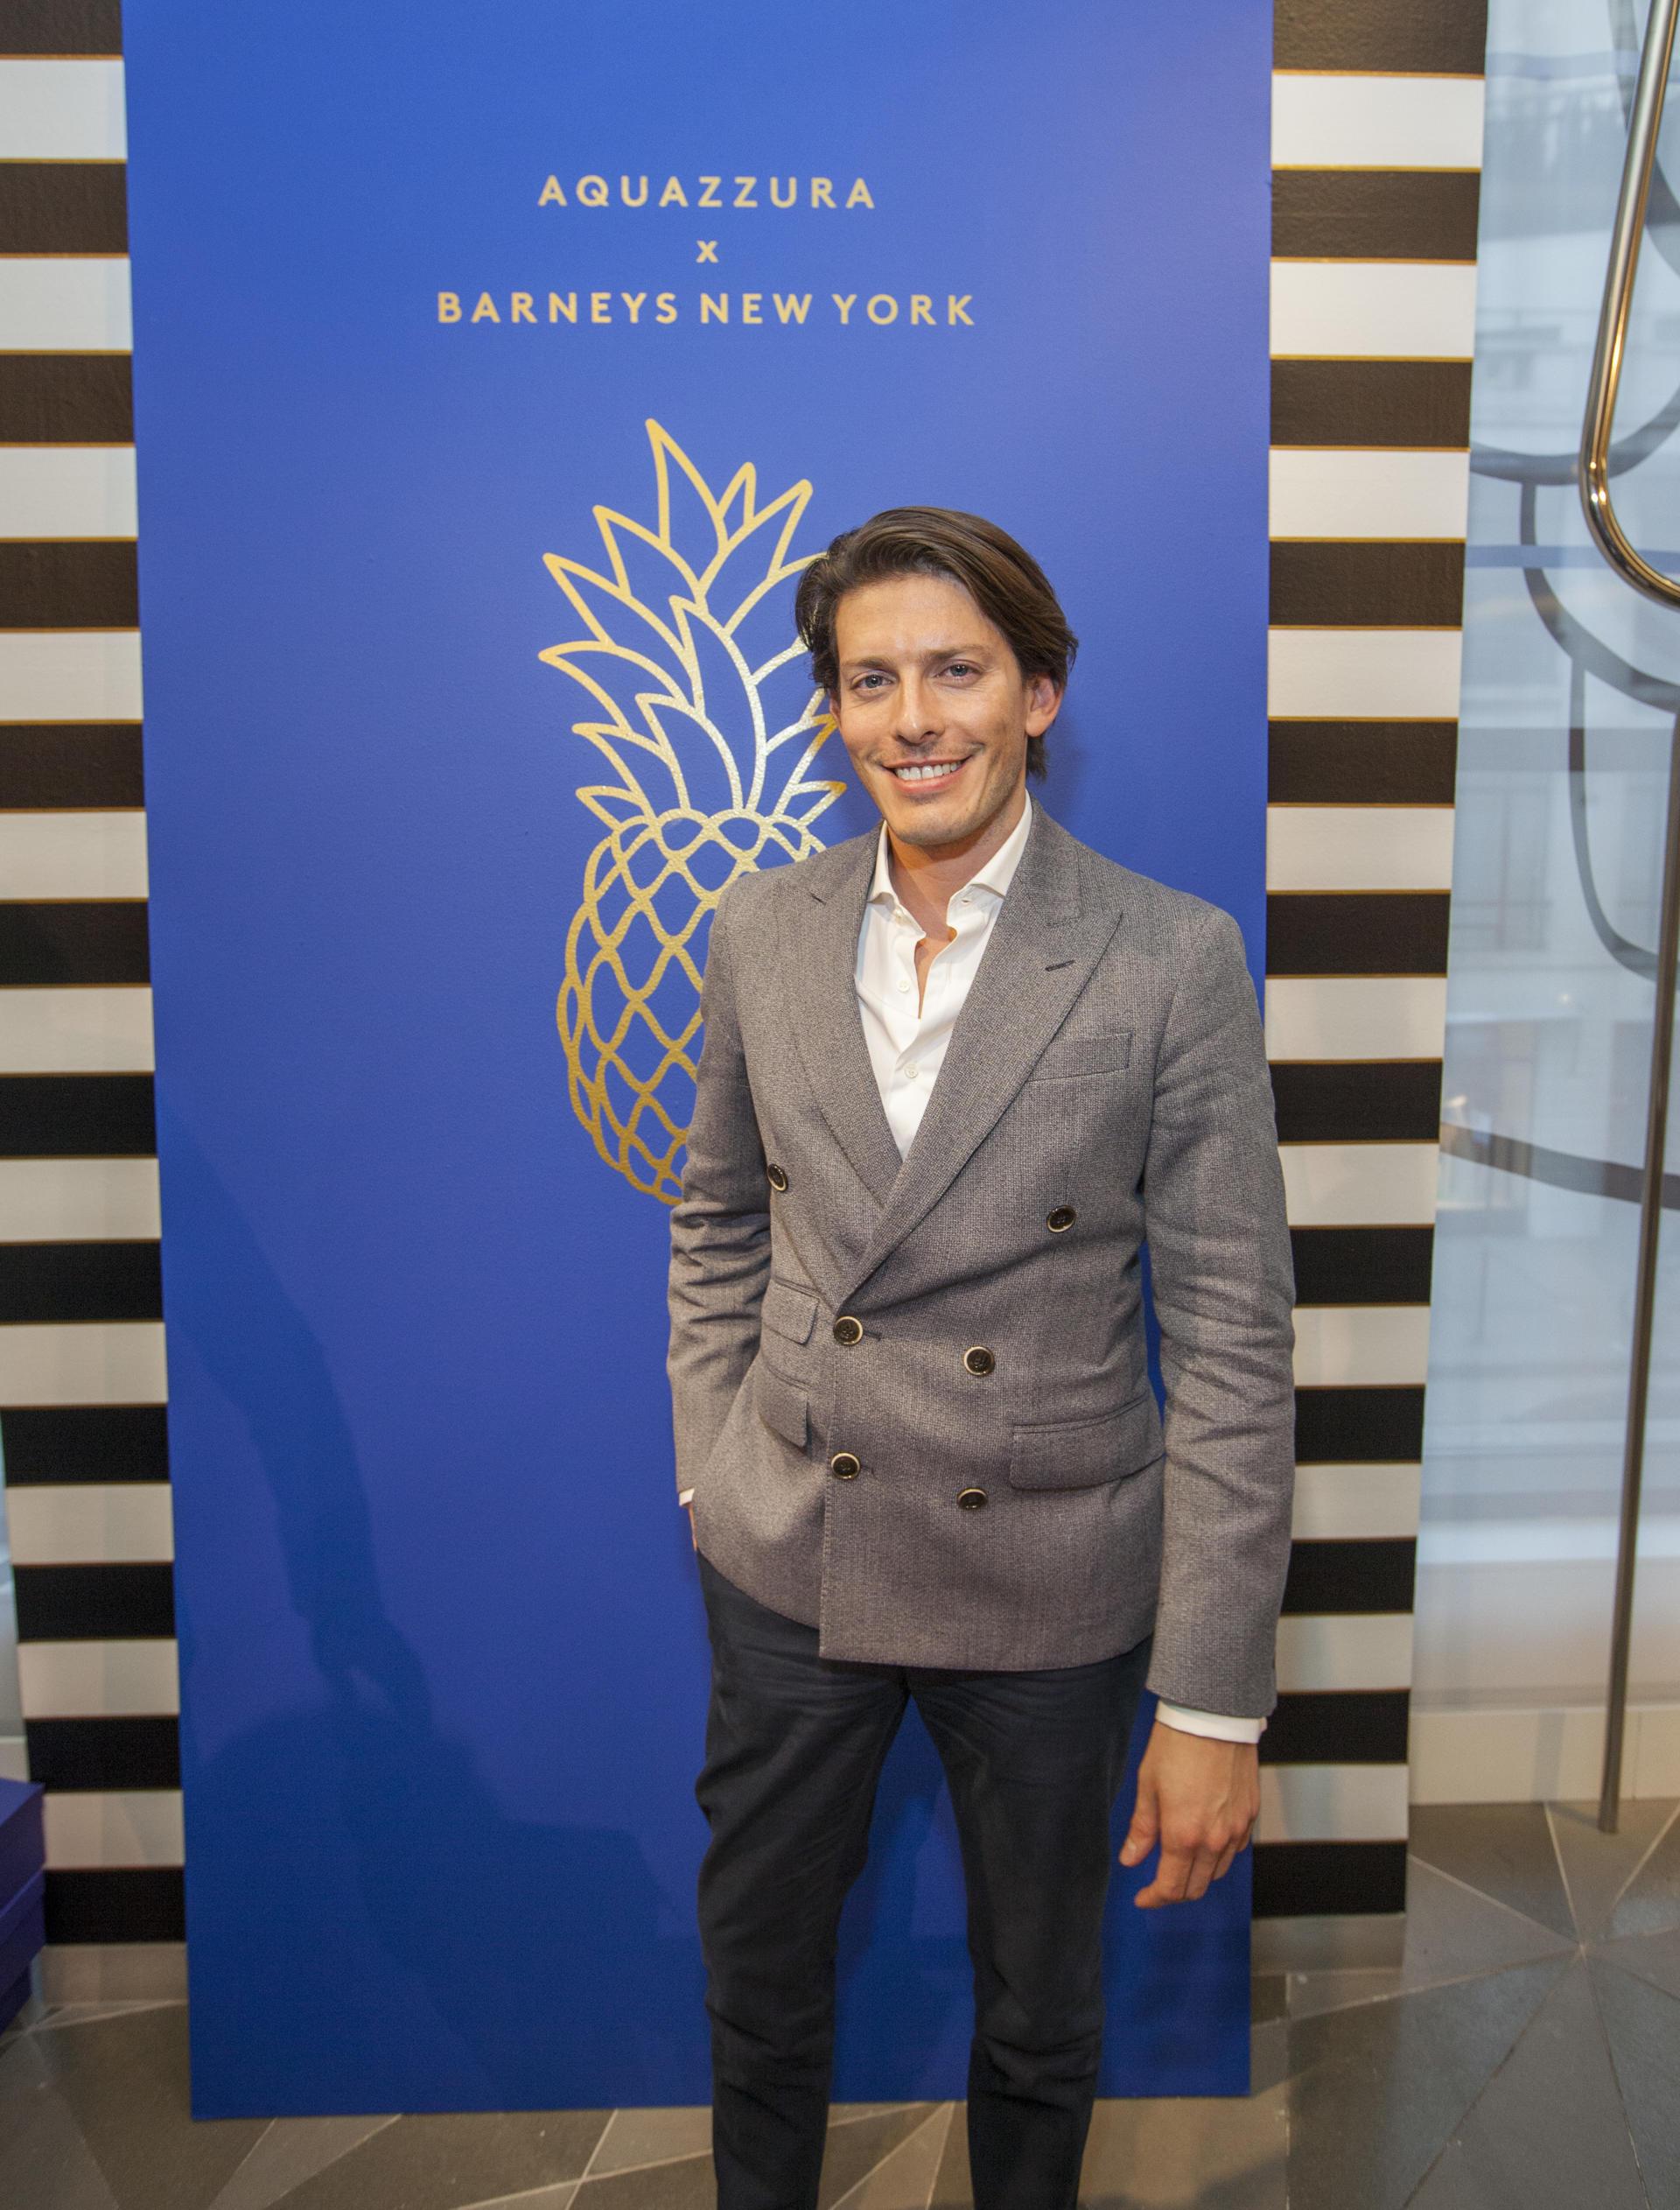 Barneys Chicago Edgardo Osorio Interview Aquazzura